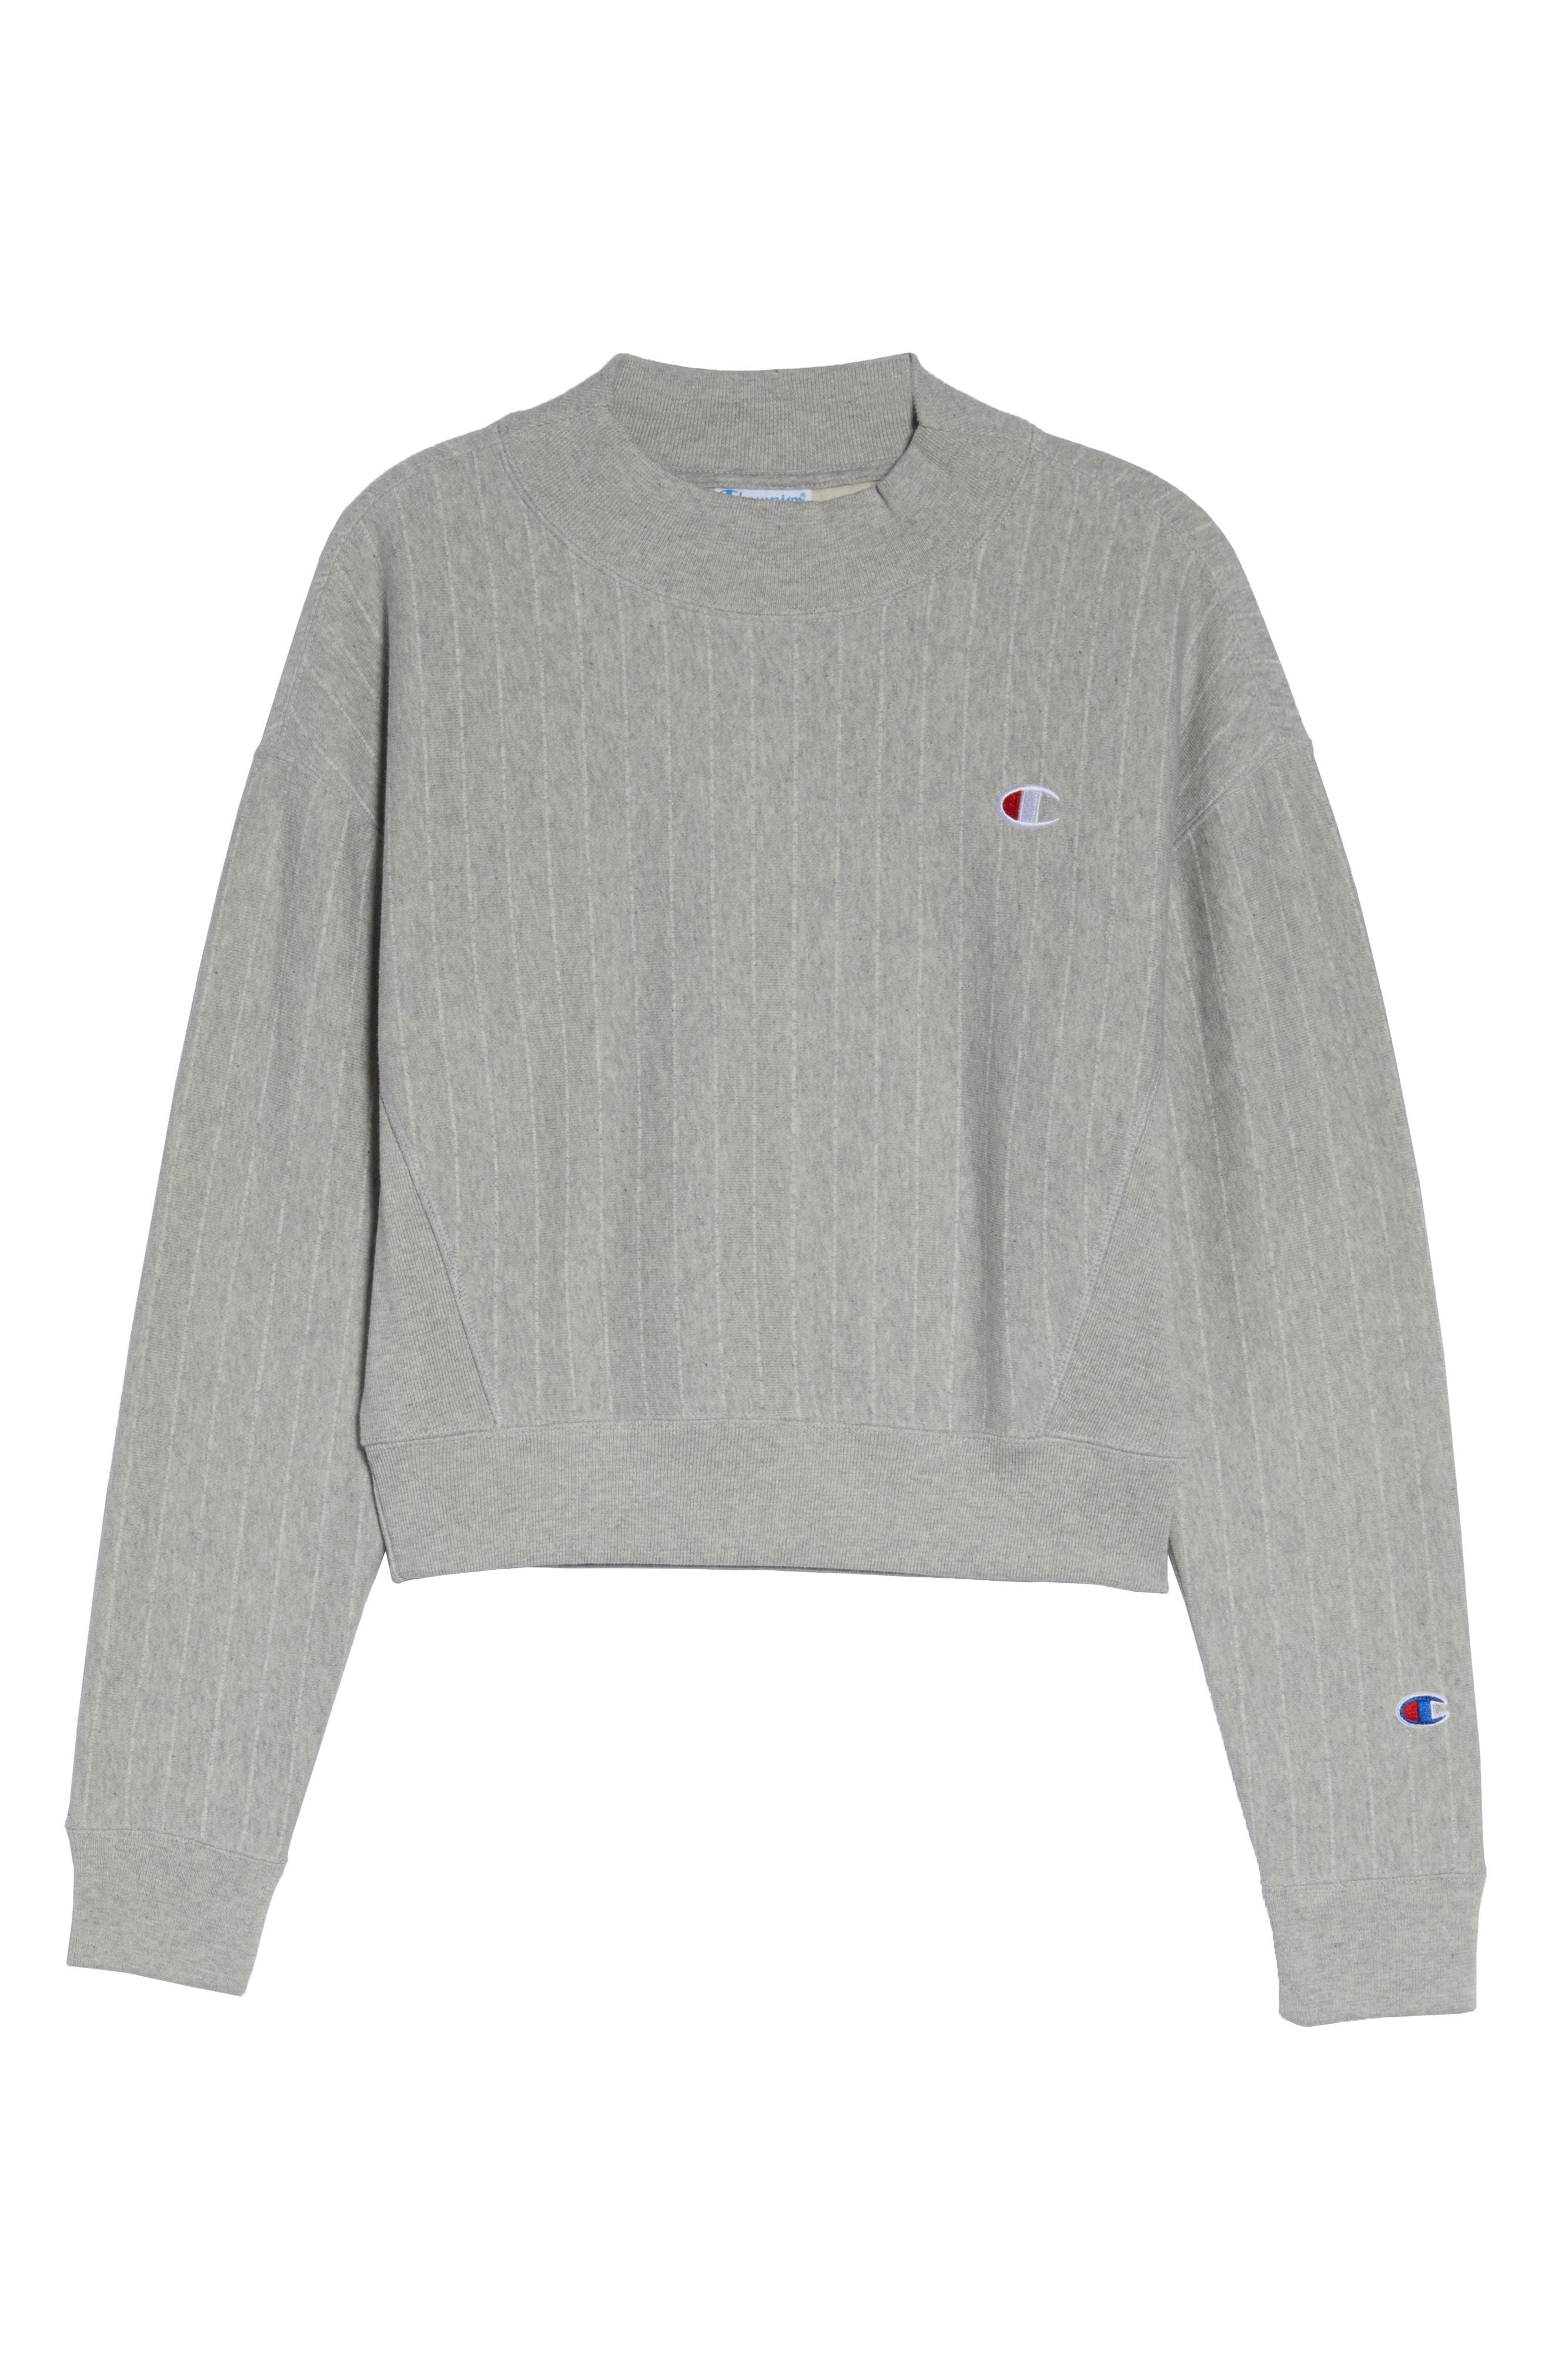 CHAMPION, Mock Neck Reverse Panel Crop Sweatshirt, Alternate thumbnail 5, color, PINSTRIPE OXFORD GREY